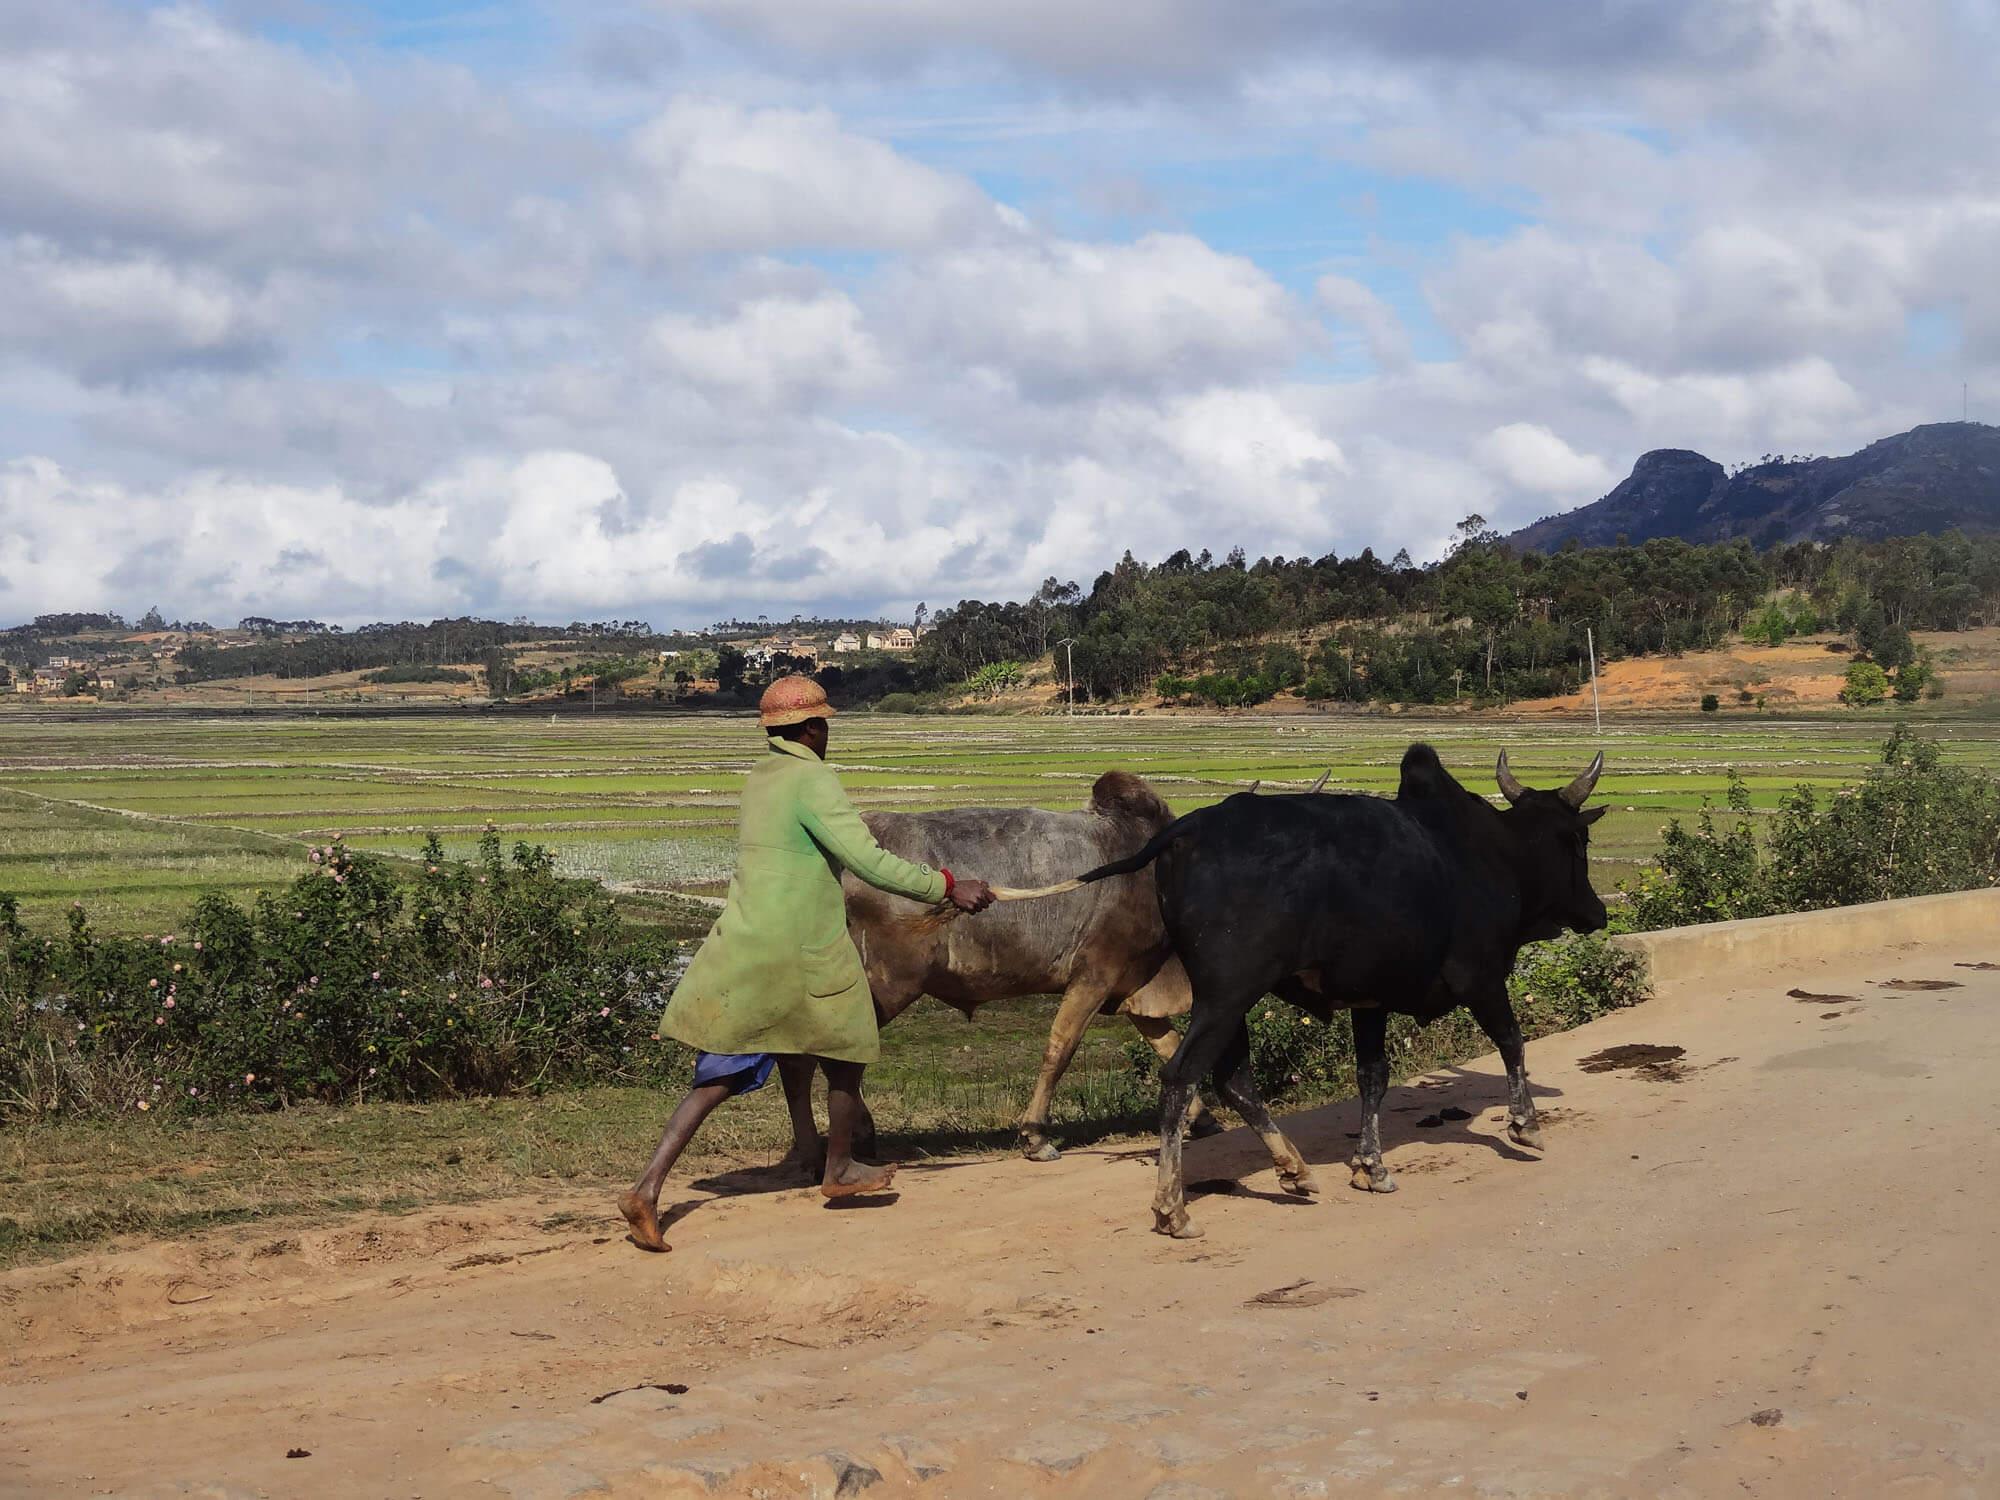 Mada011 VIAGGIO IN MADAGASCAR